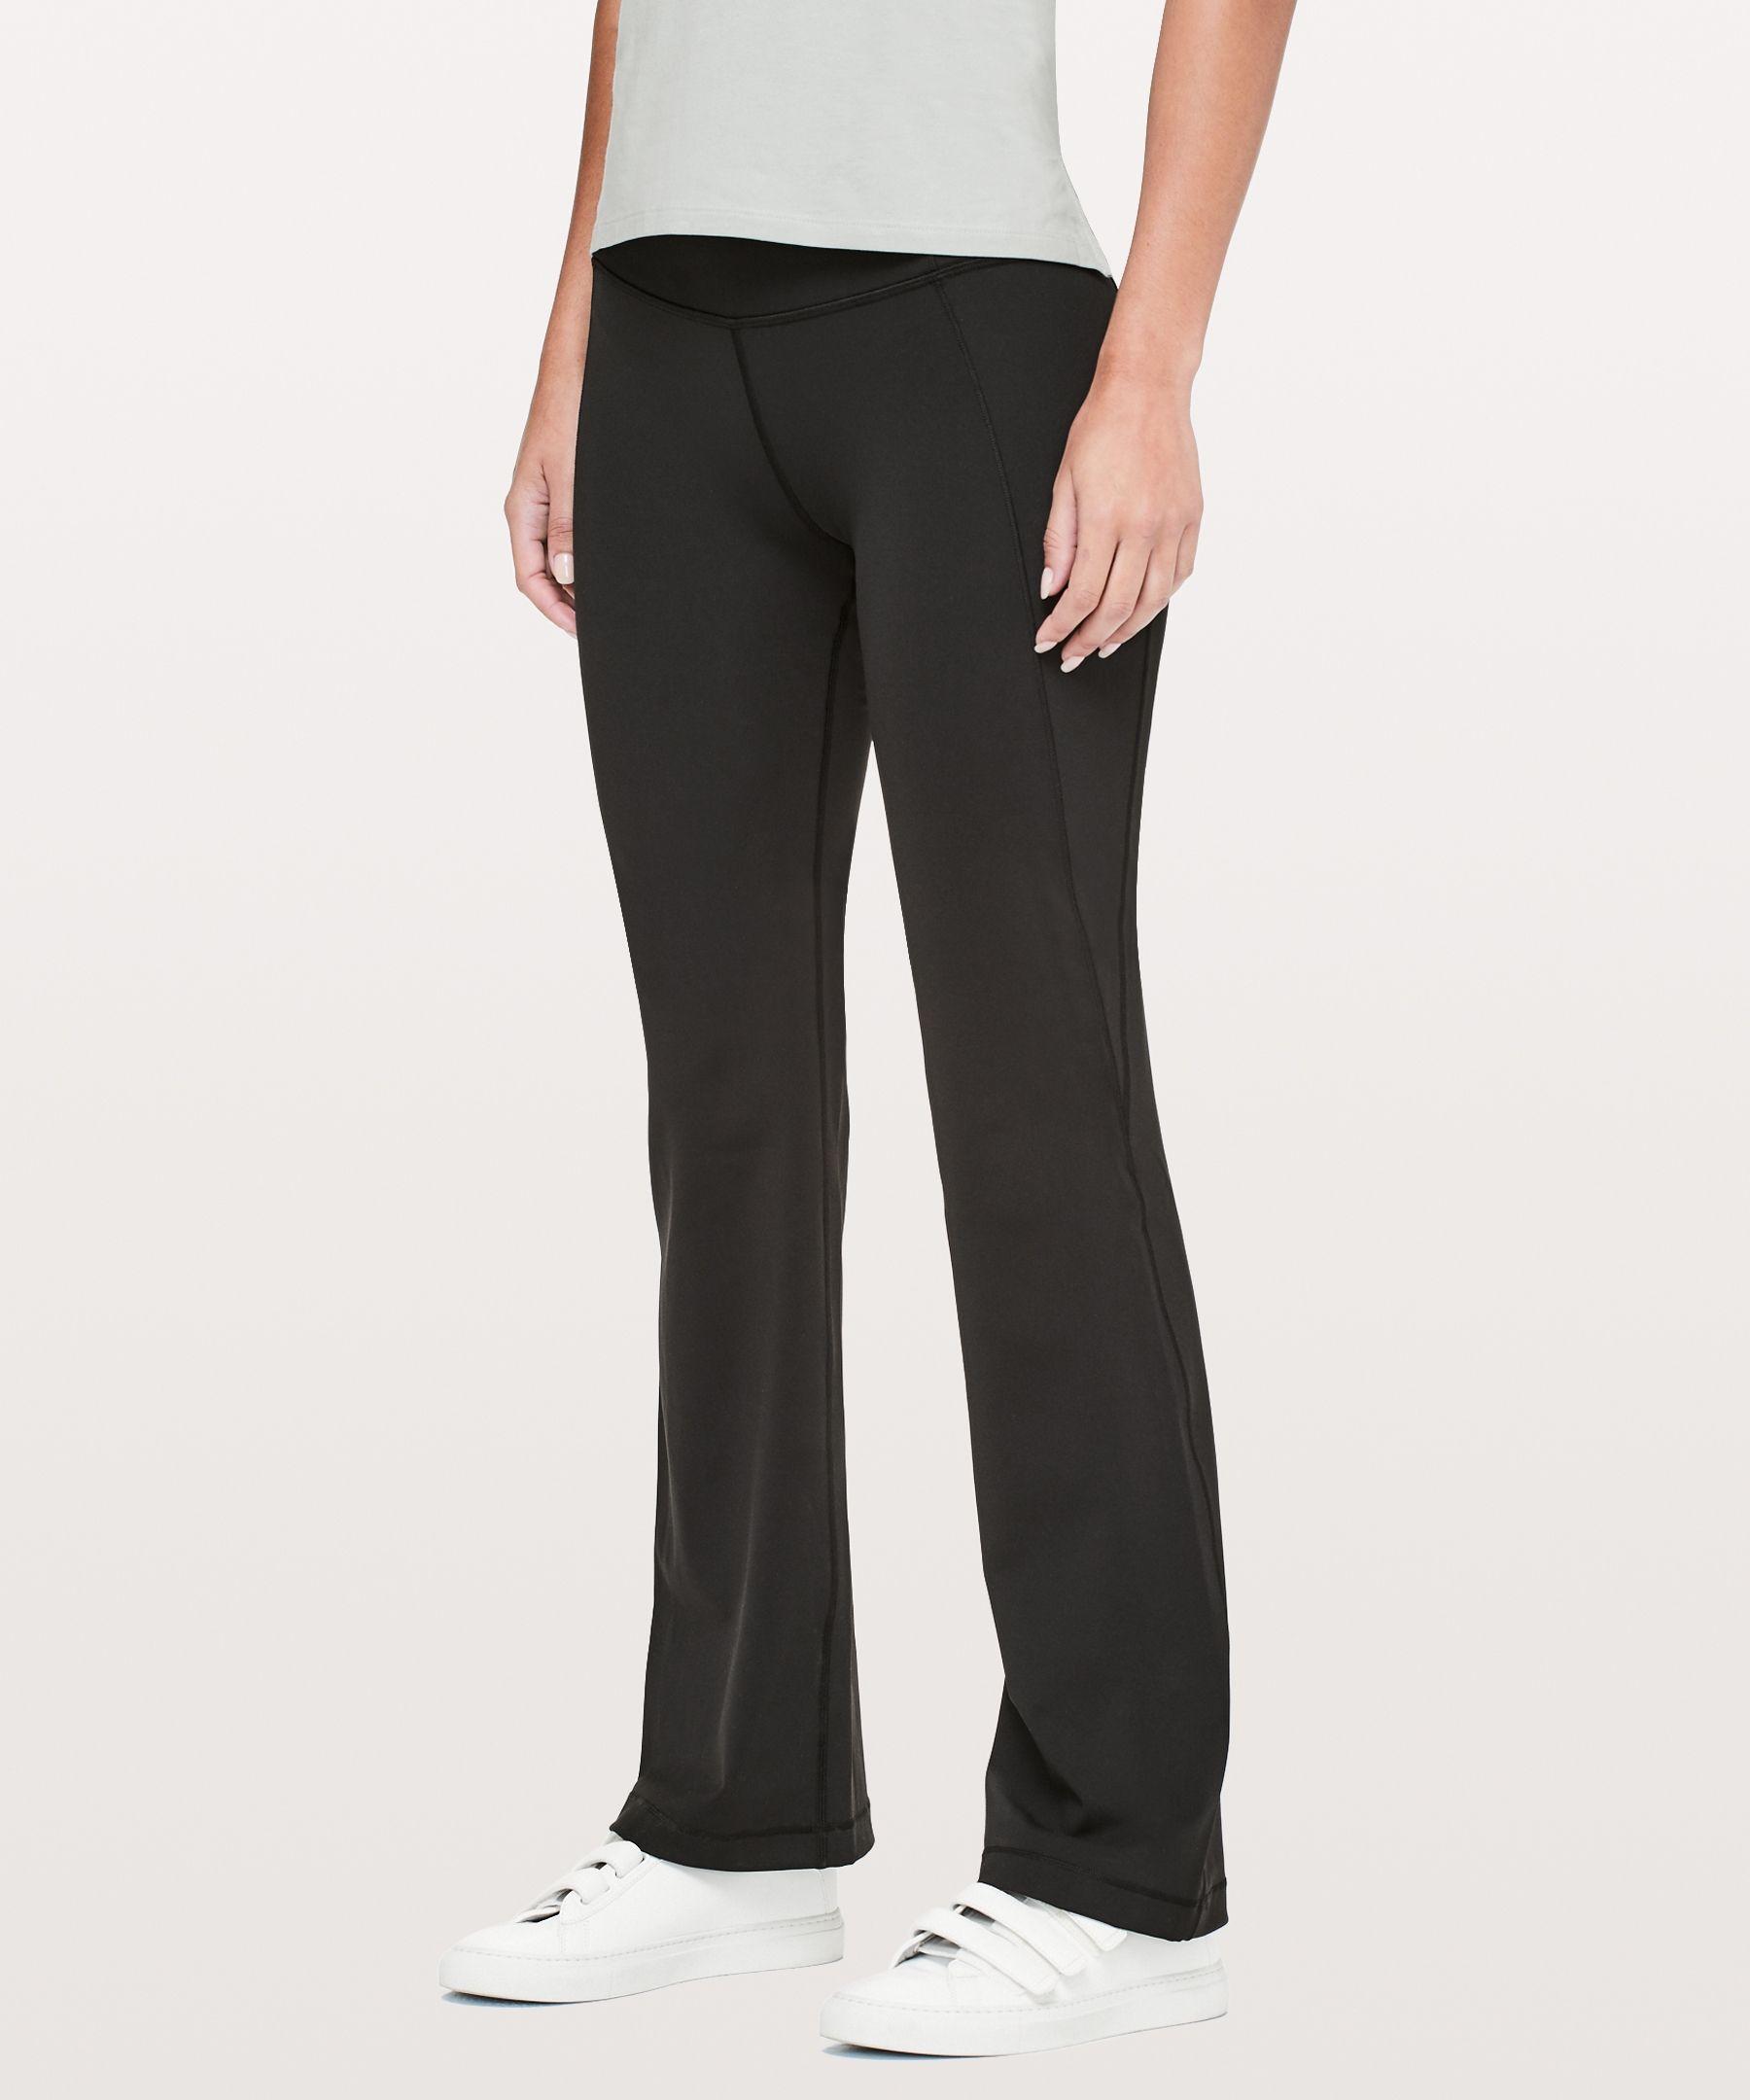 2368ed4a42 Lululemon Groove Bootcut Want Love Pinterest Pants For Women